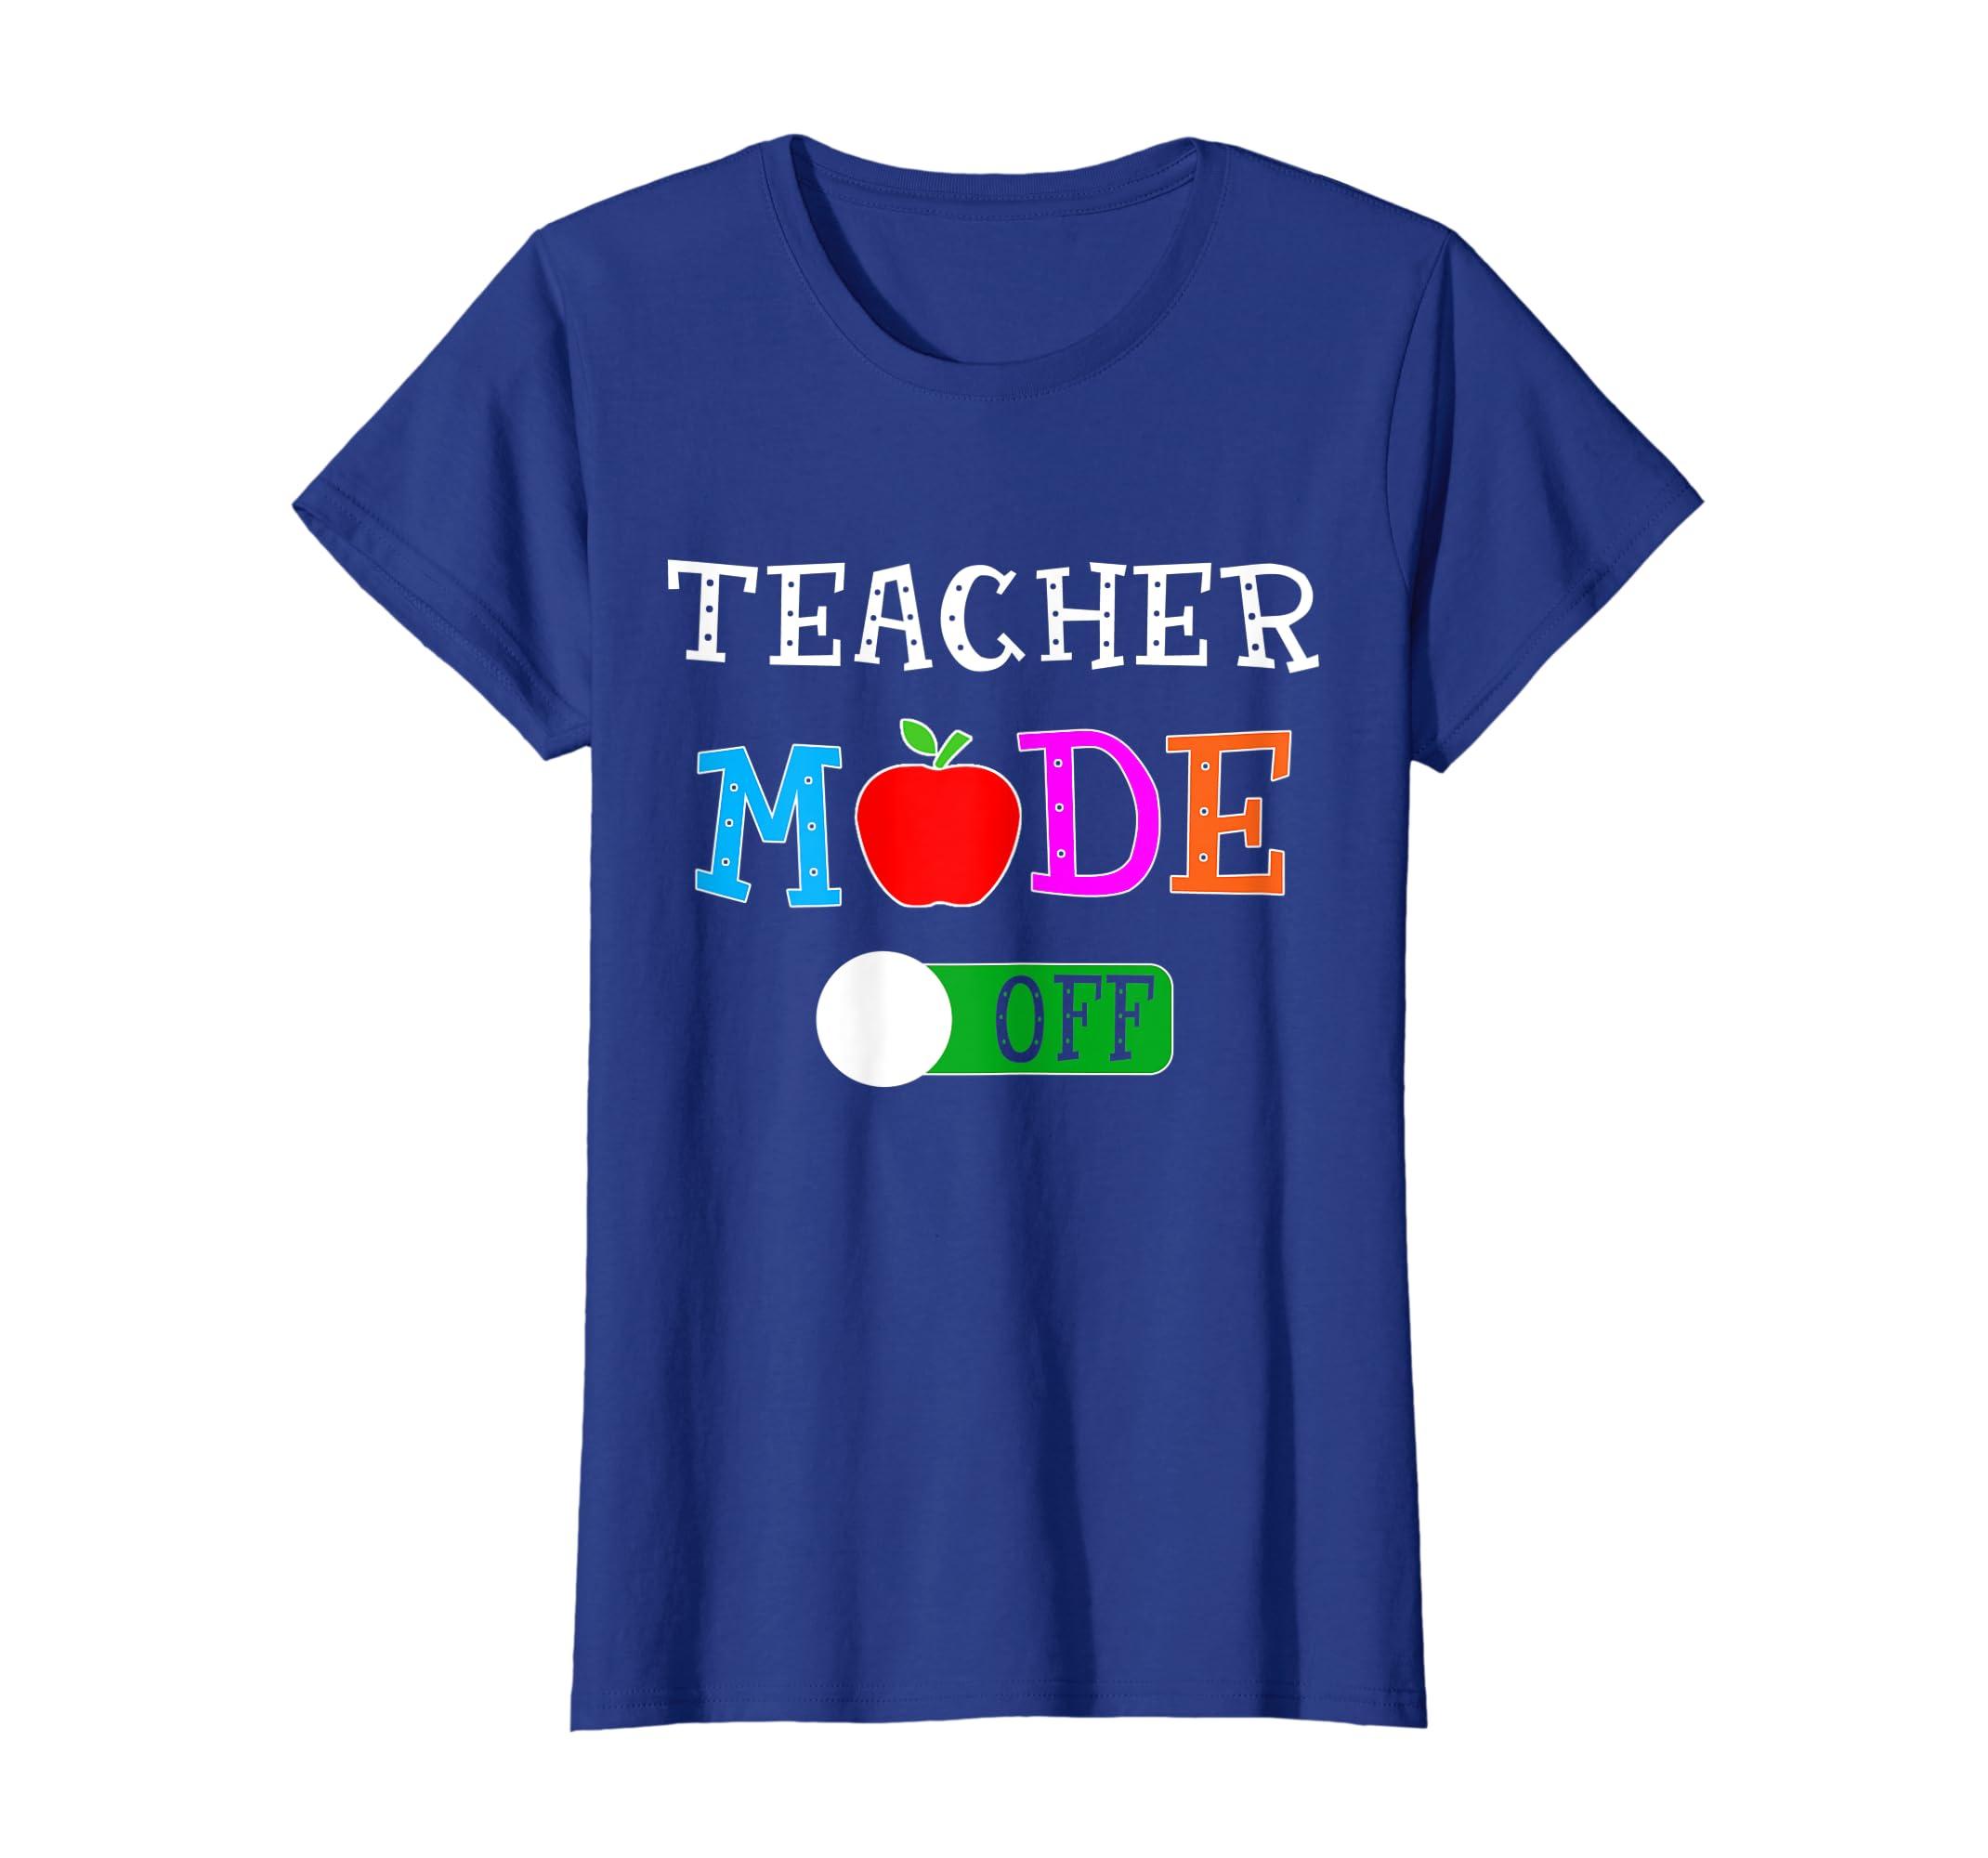 8253b9f37be78 Amazon.com: Teacher Mode Off T Shirt Last Day of School Funny Cute ...